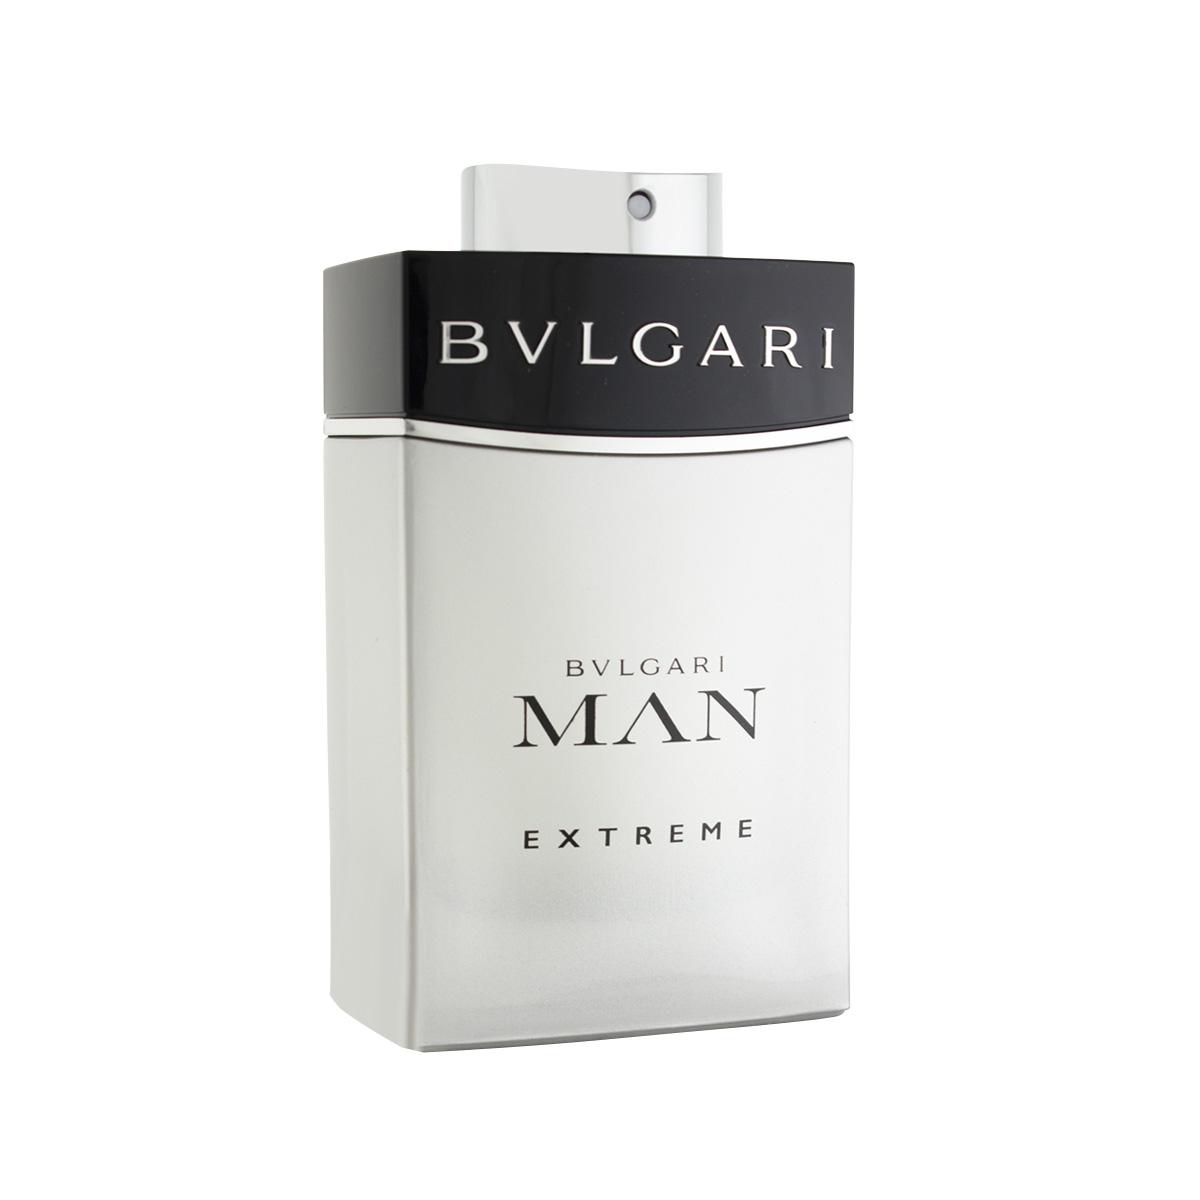 Bvlgari Man Extreme EDT tester 100 ml M